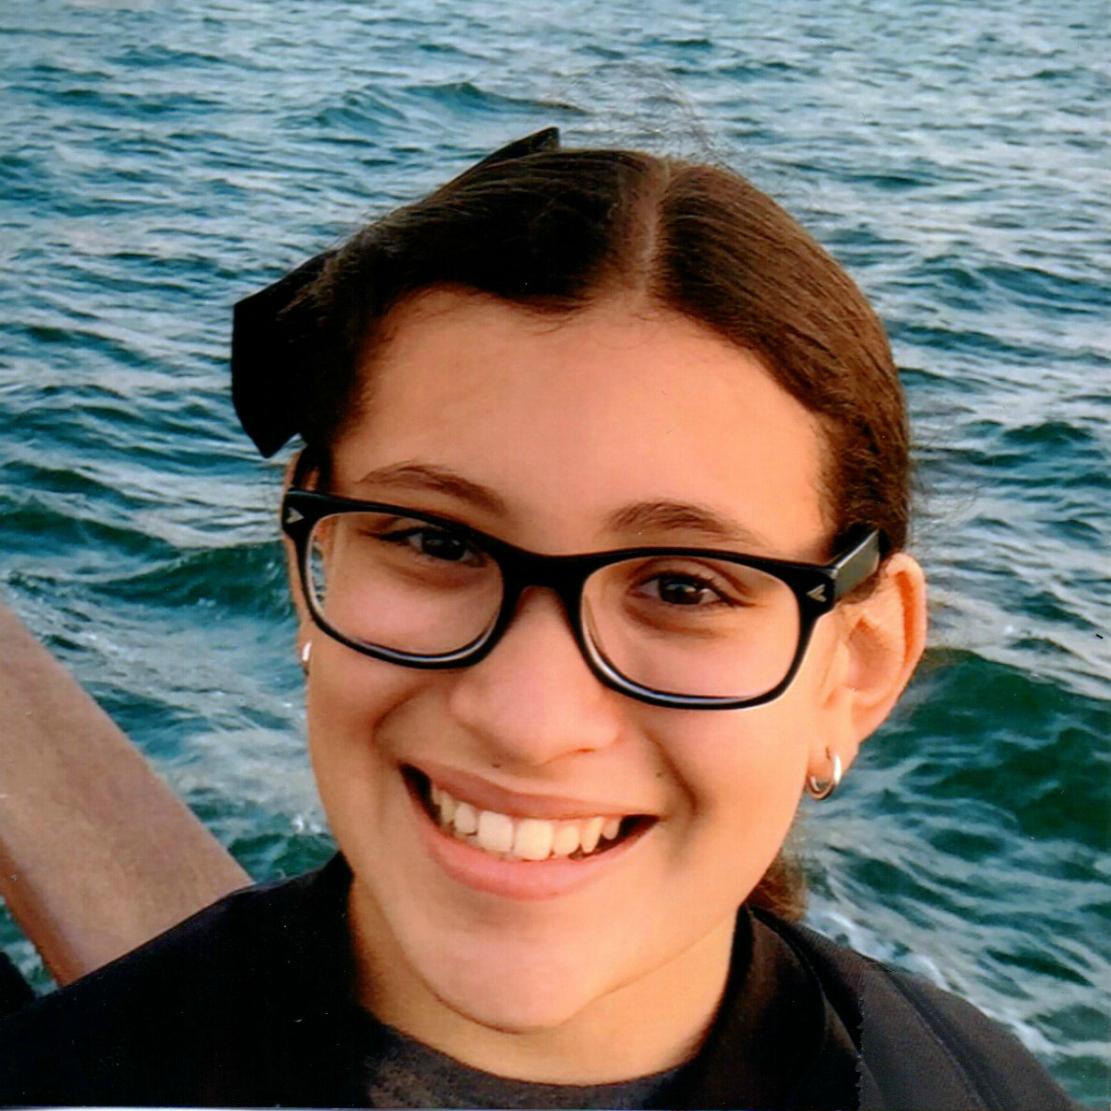 Stem School Wilmington Nc: Meet Sarah Rodriguez